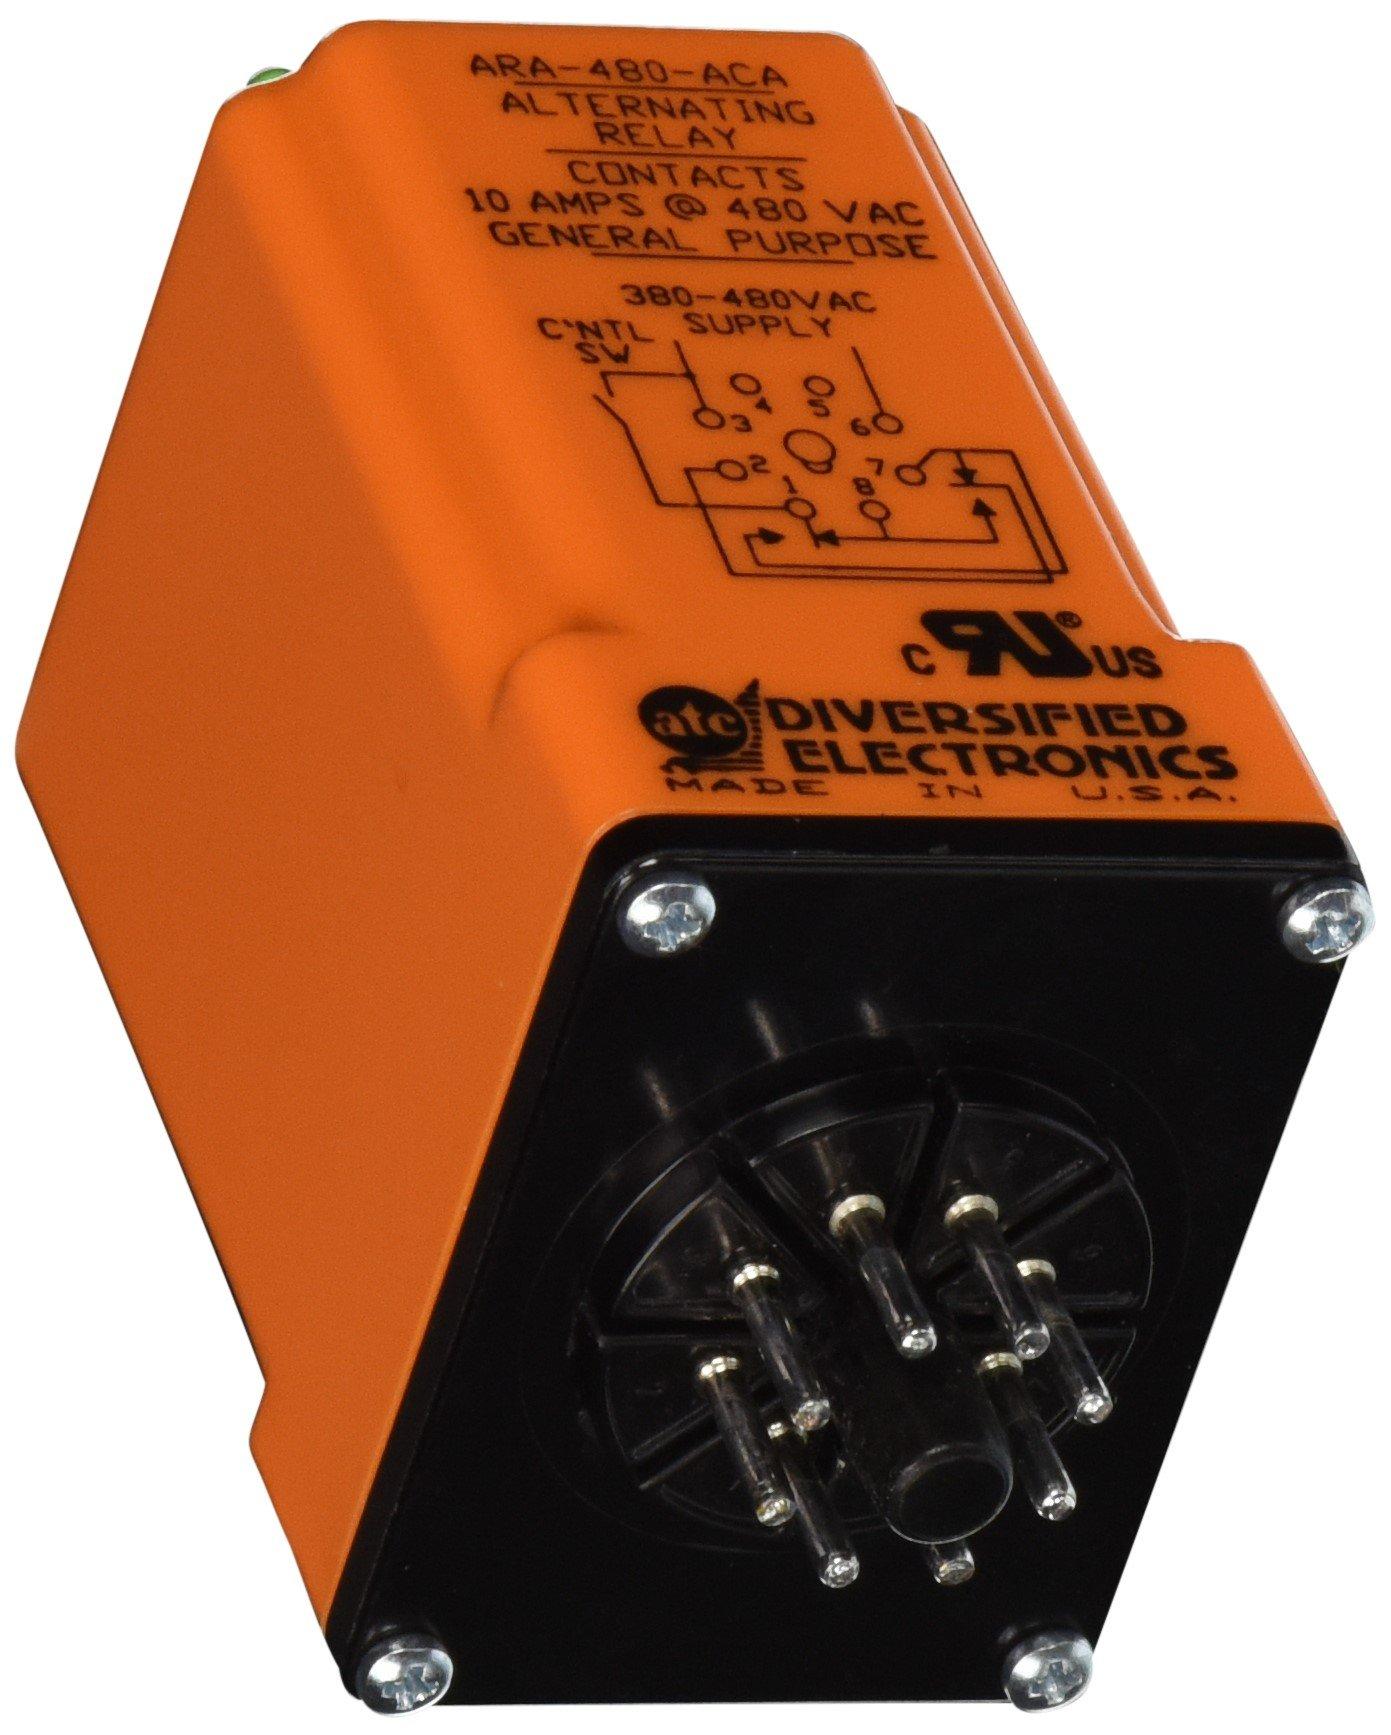 ATC ARA-480-ACA Plug-In Duplexor Alternating Relay, 480 VAC, DPDT x Wired